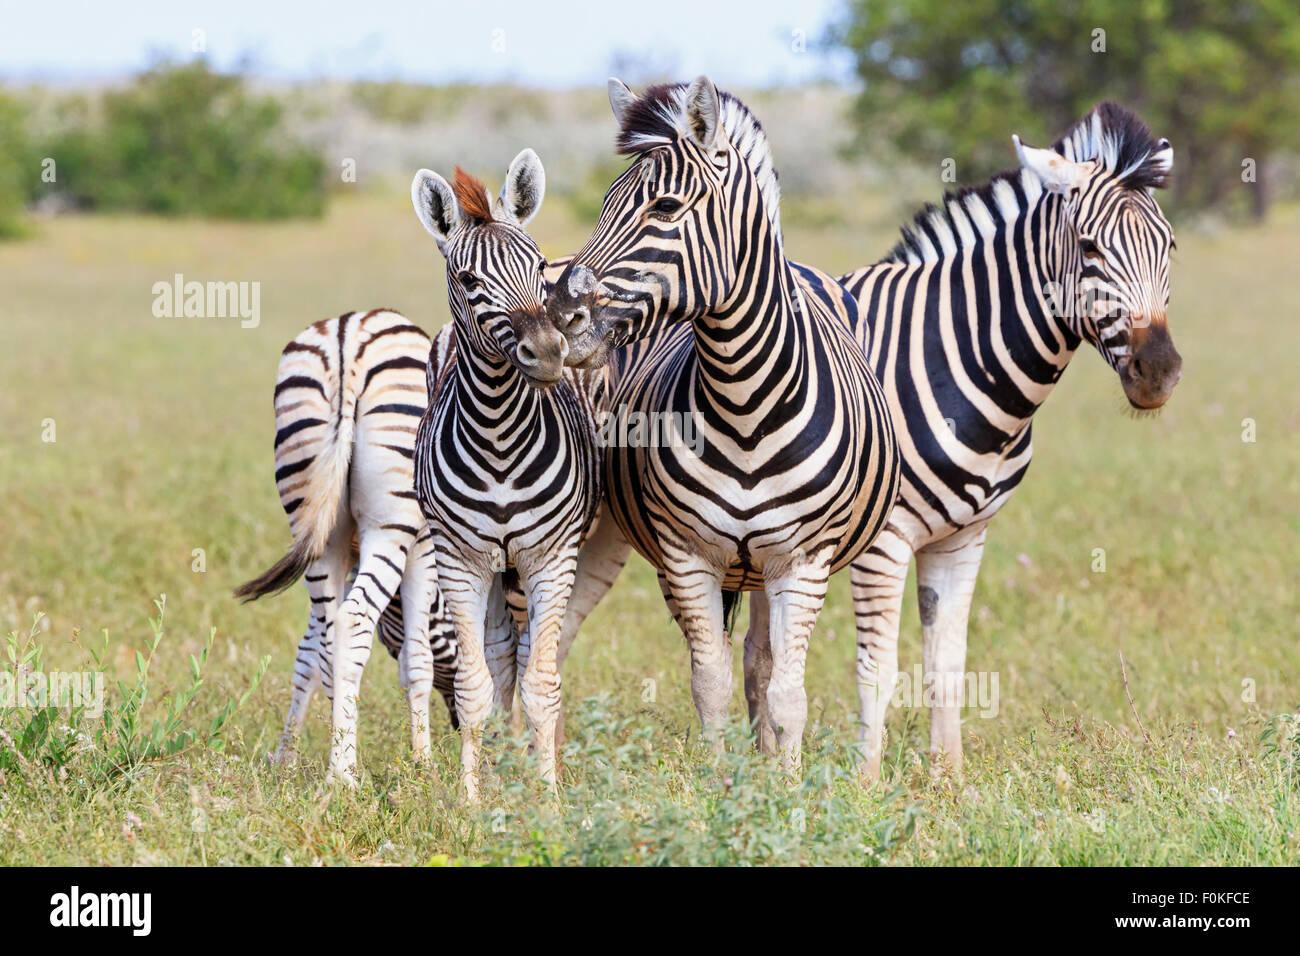 Namibia, Etosha National Park, family of plains zebras Stock Photo